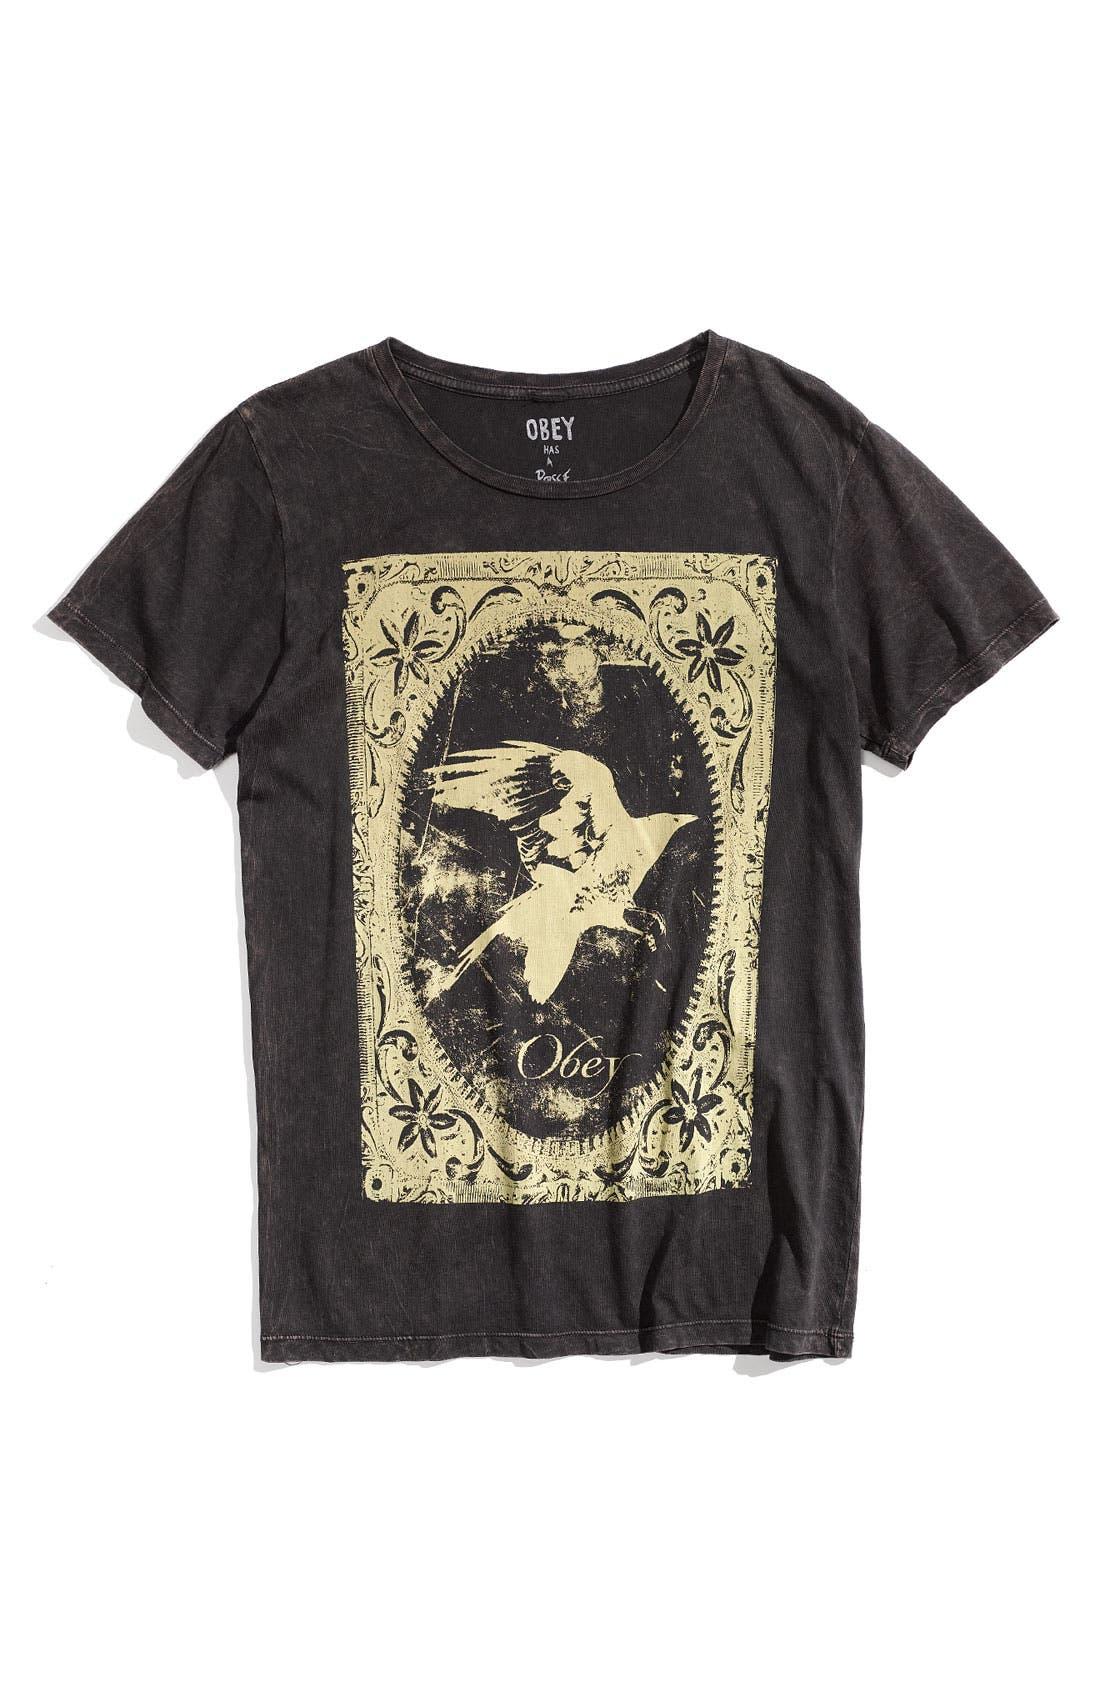 Alternate Image 1 Selected - Obey 'Black Crow' Trim Fit Crewneck T-Shirt (Men)